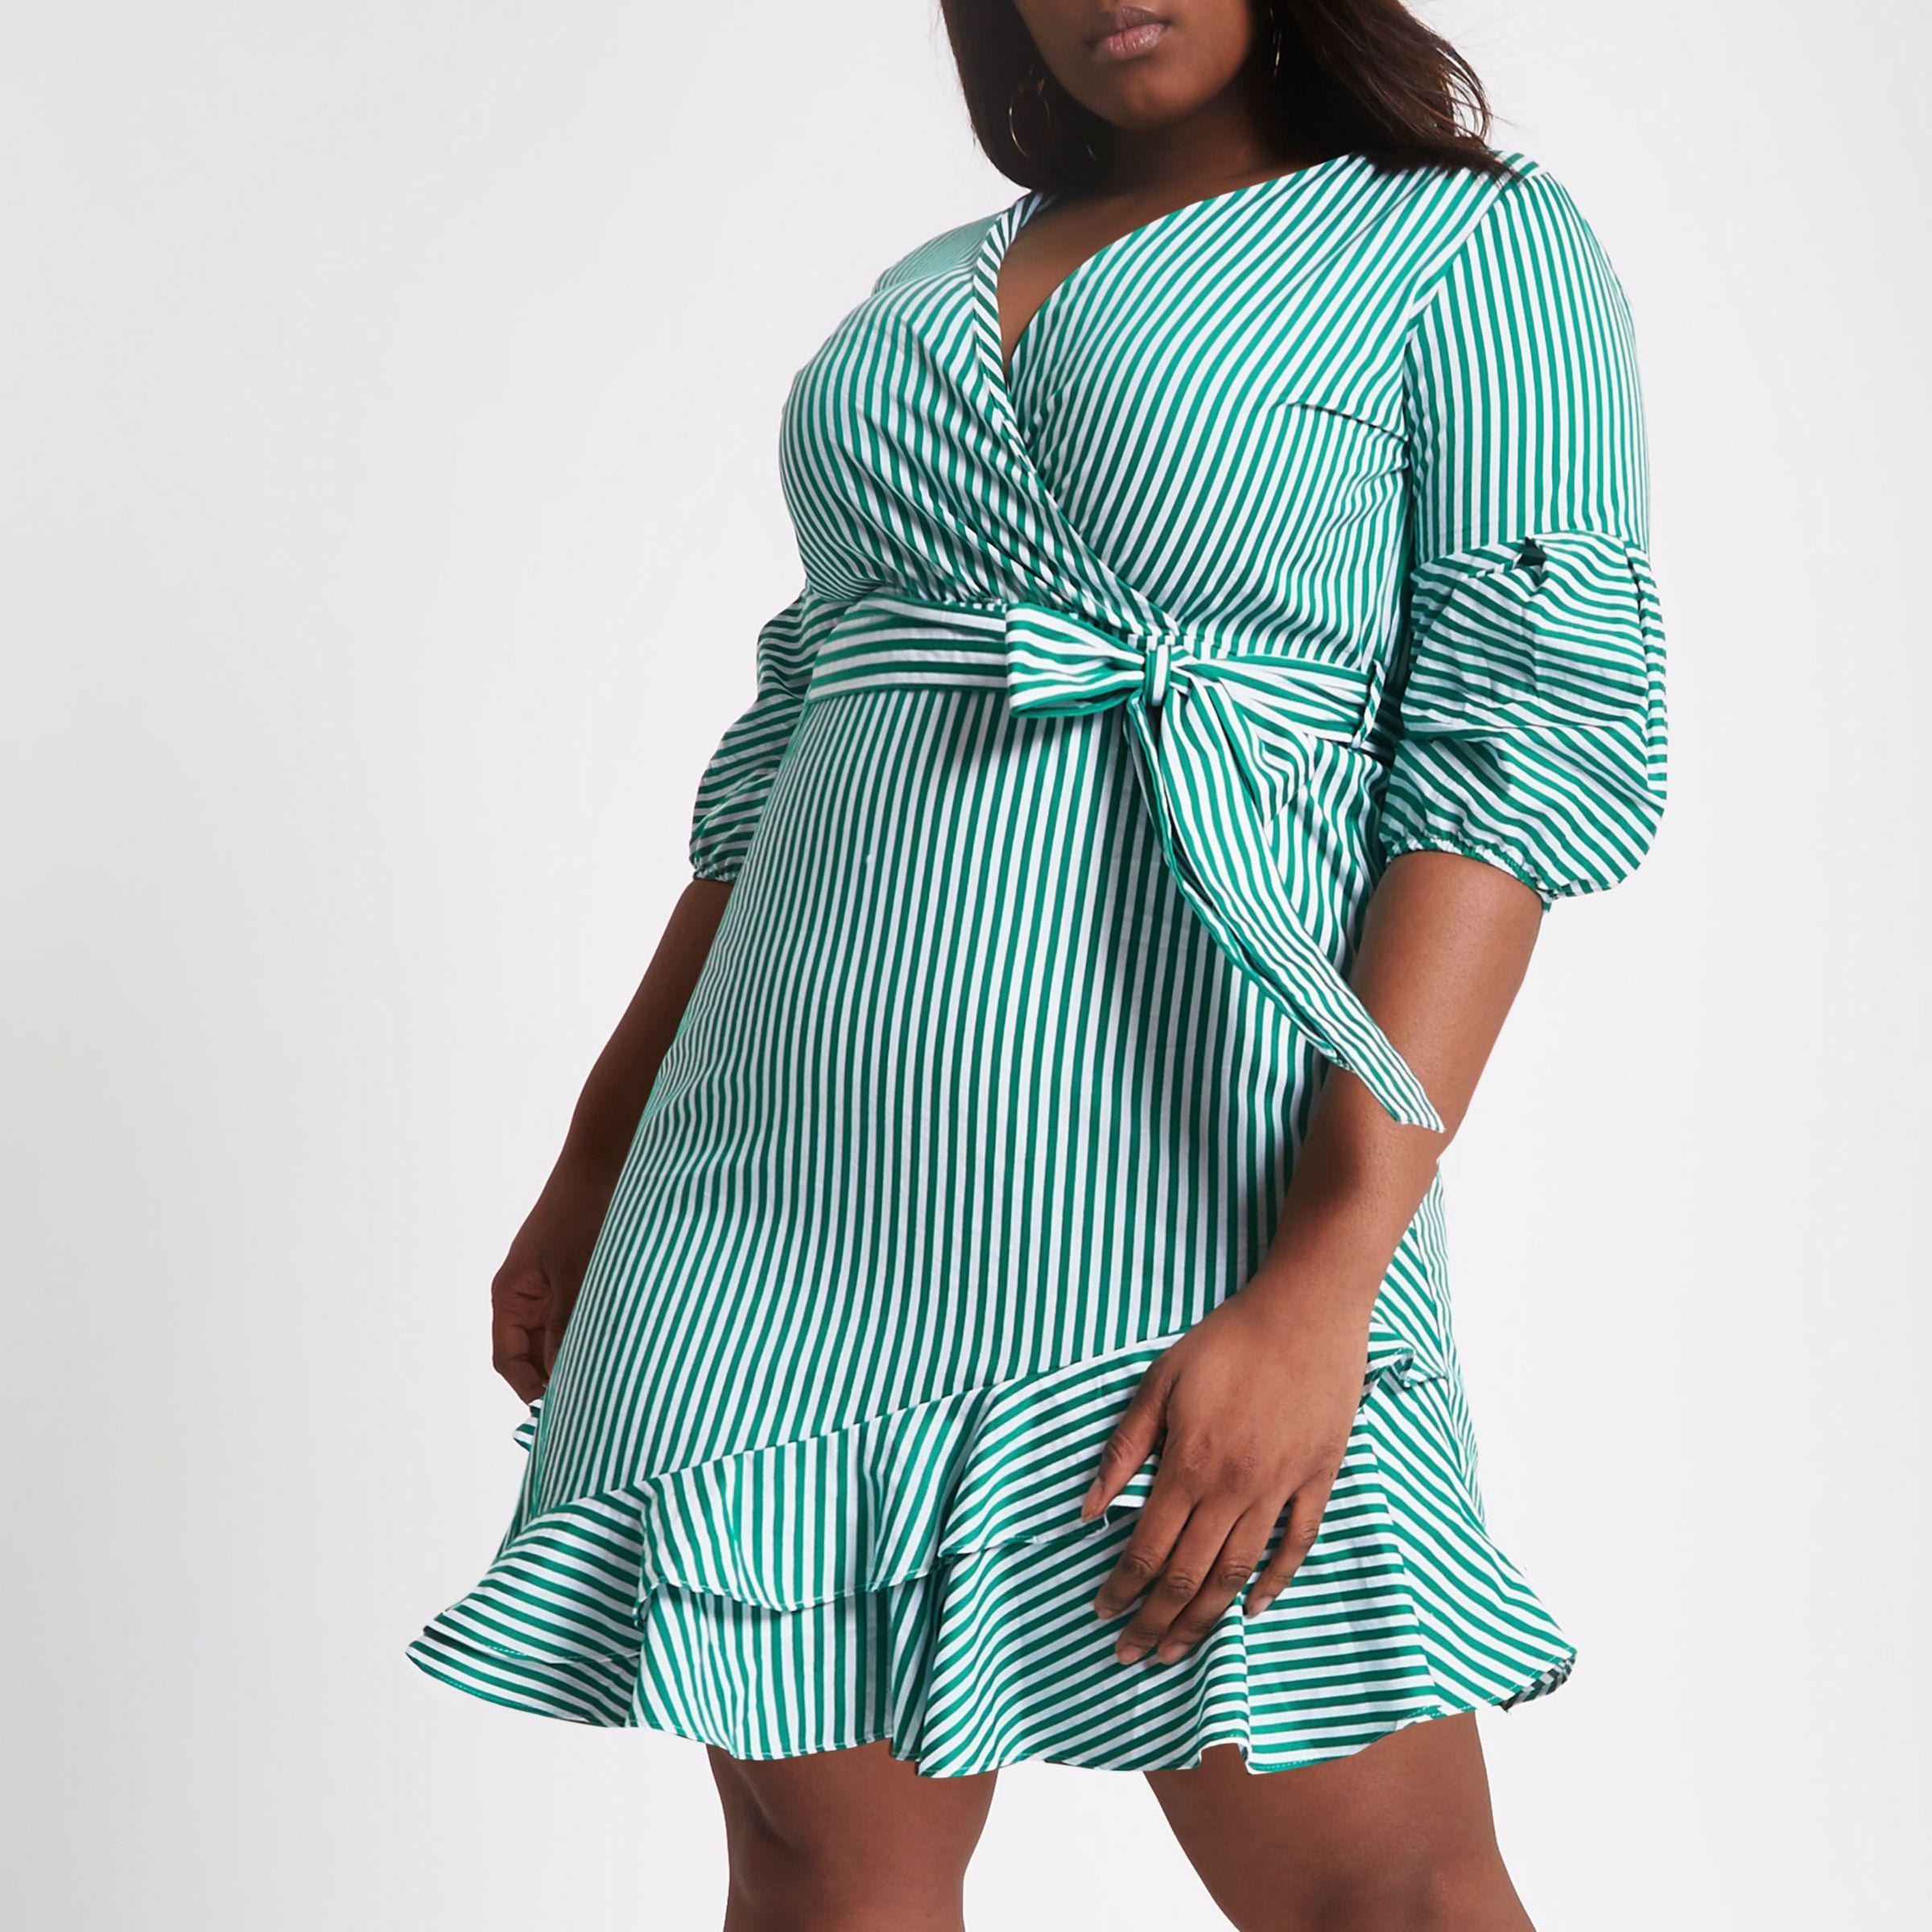 Lyst - River Island Plus Green Stripe Wrap Puff Sleeve Dress in Green 0e7a1f4e7efb7